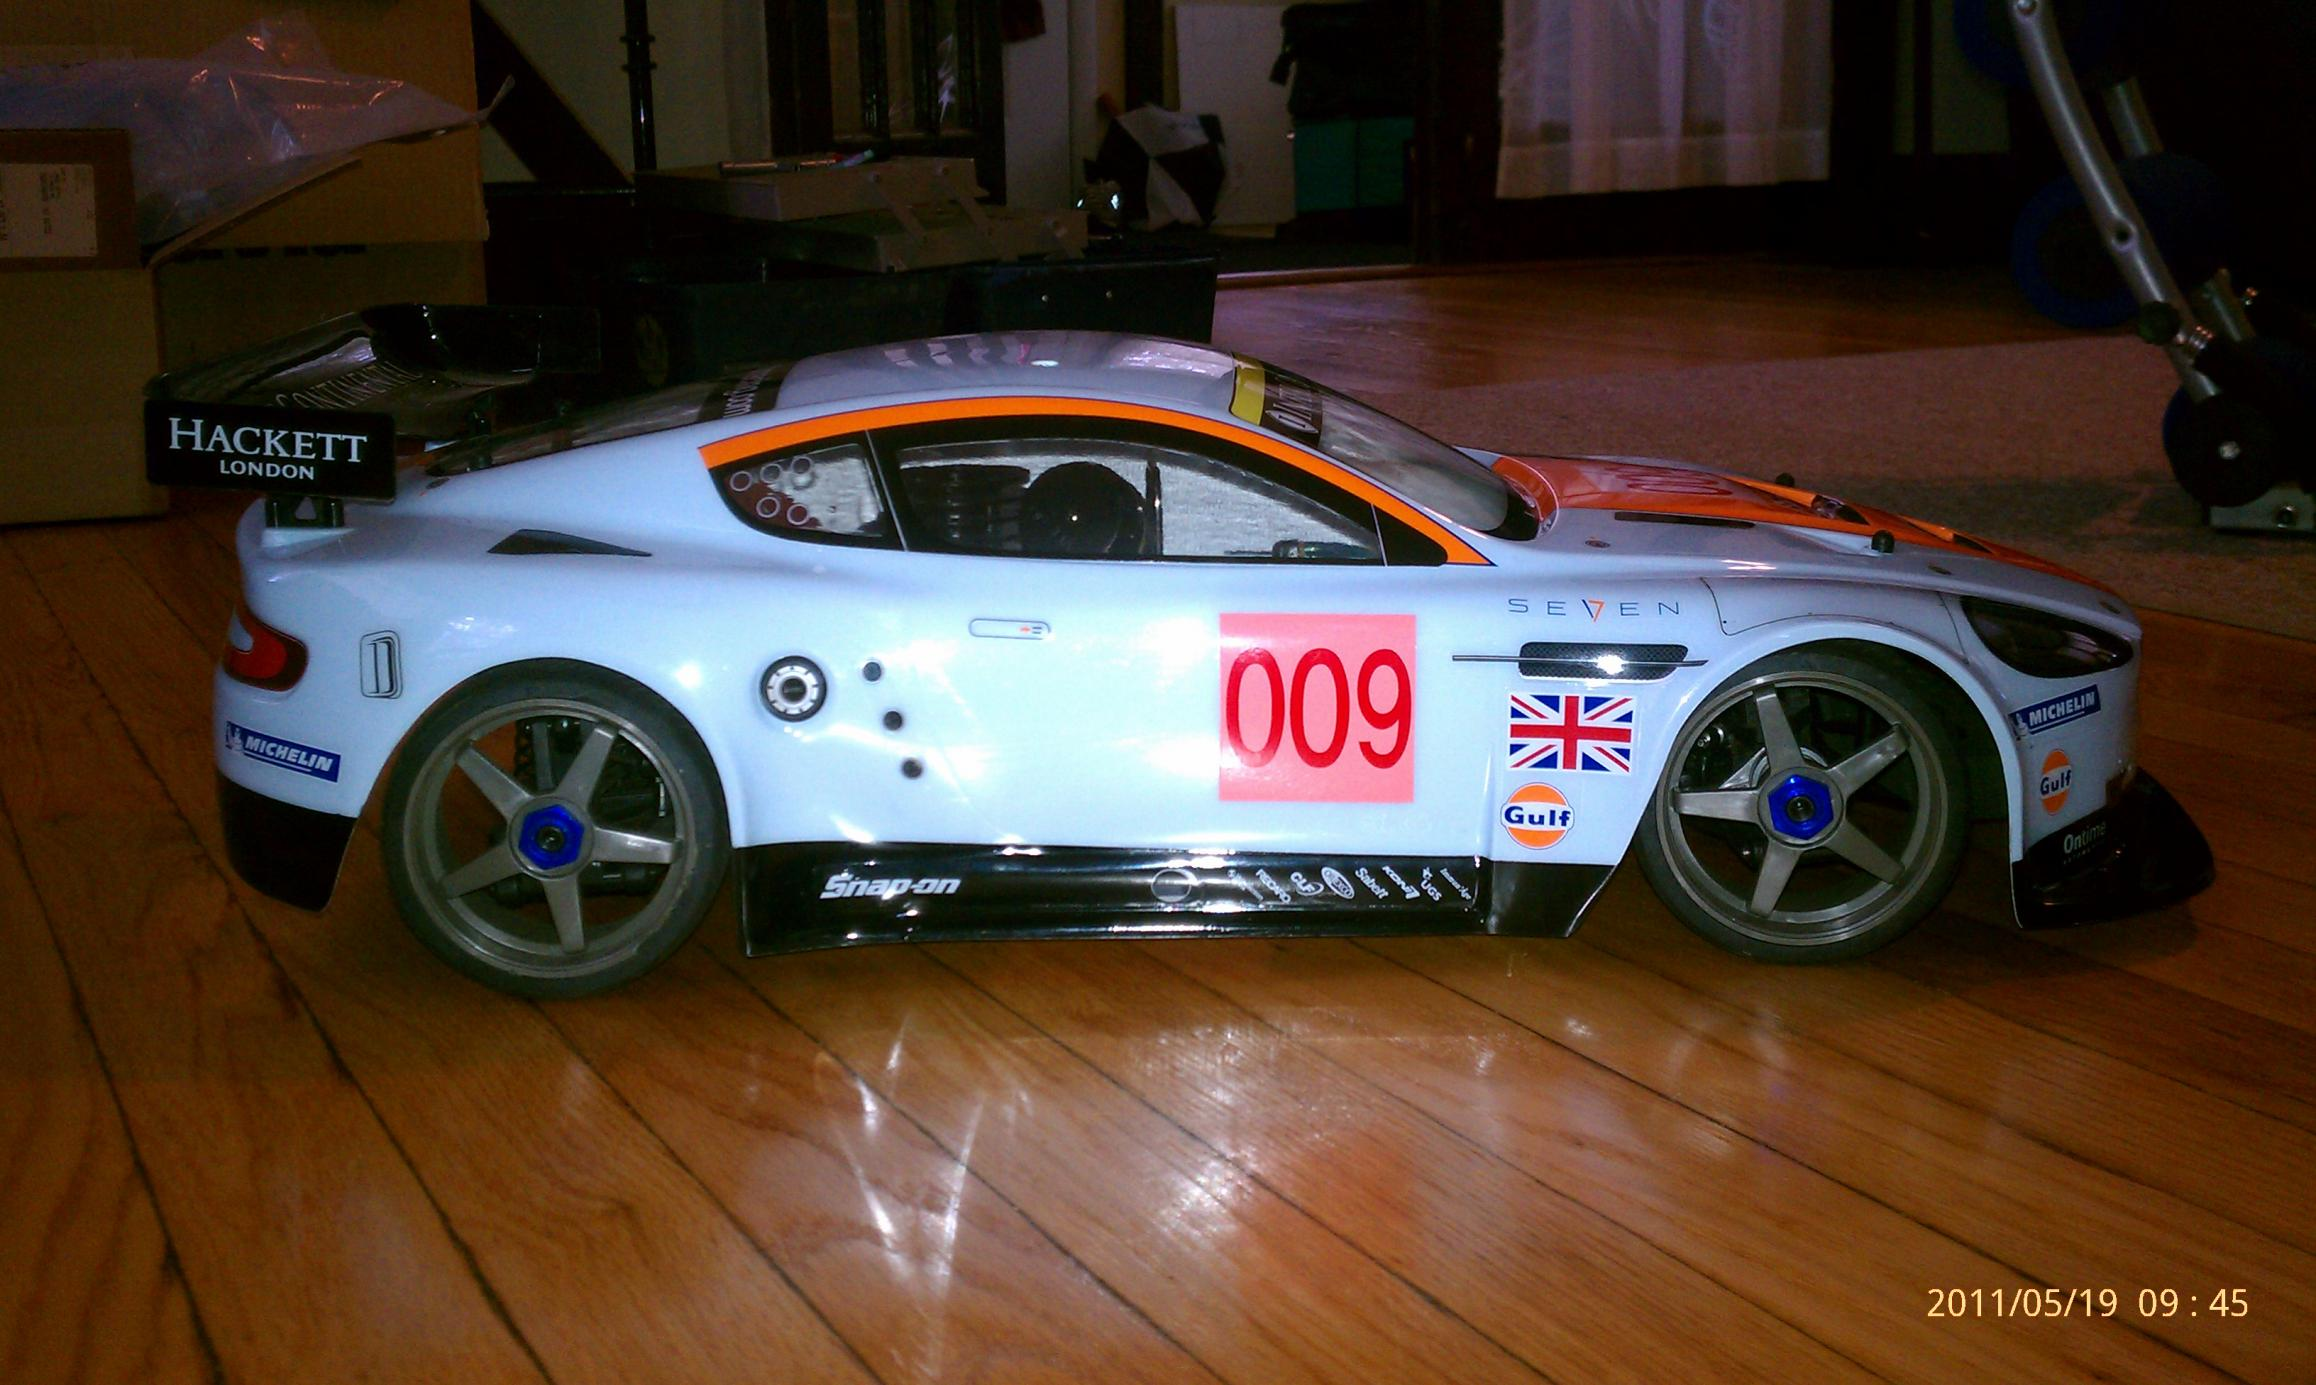 Aston Martin Used >> KYOSHO INFERNO GT2 ASTON MARTIN with upgrades. - R/C Tech ...